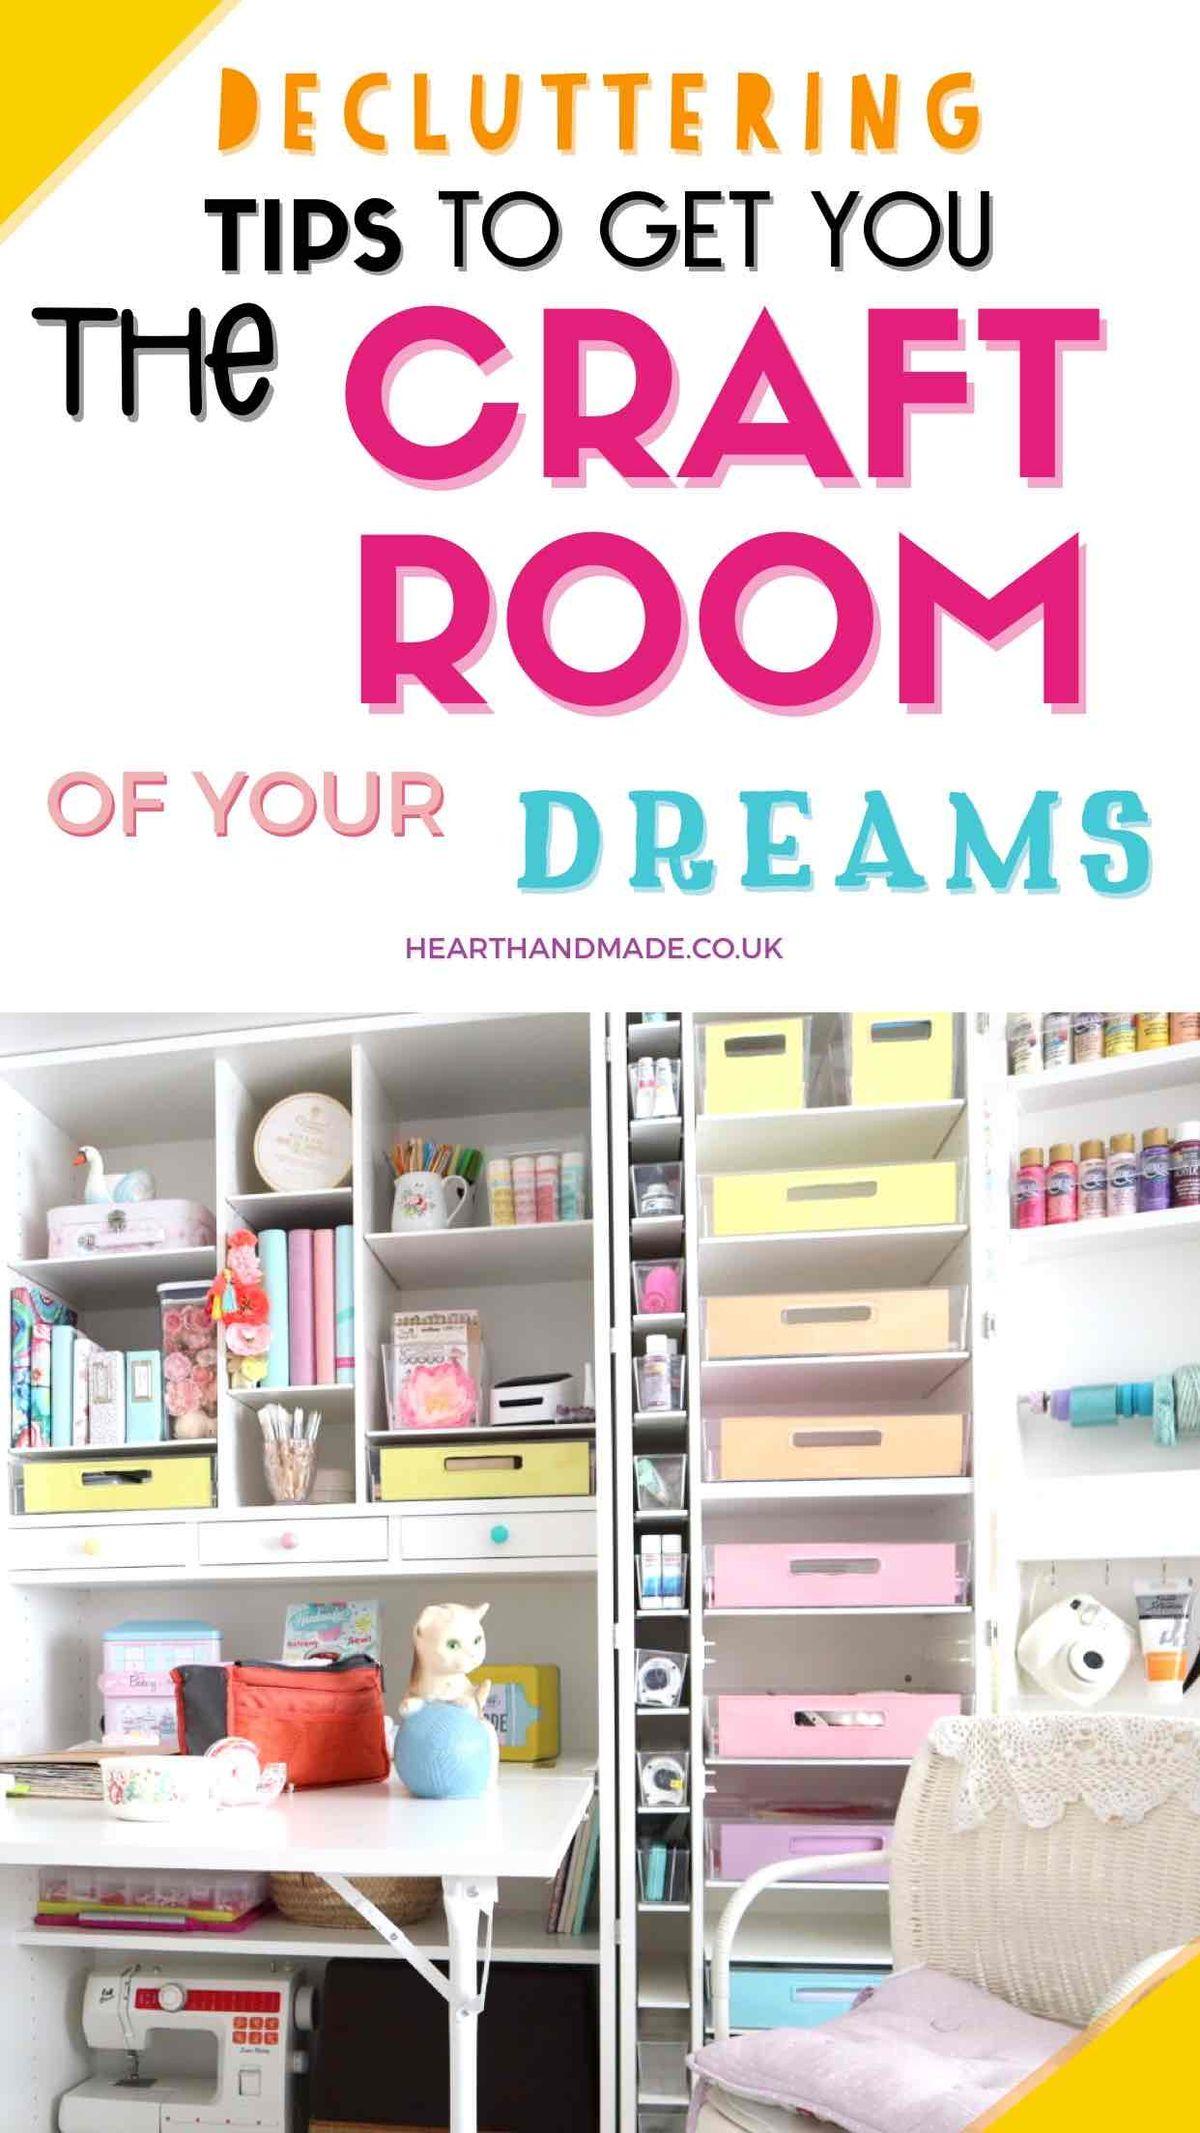 Craft Room Decluttering Tips Guaranteed To Make Decluttering Easier